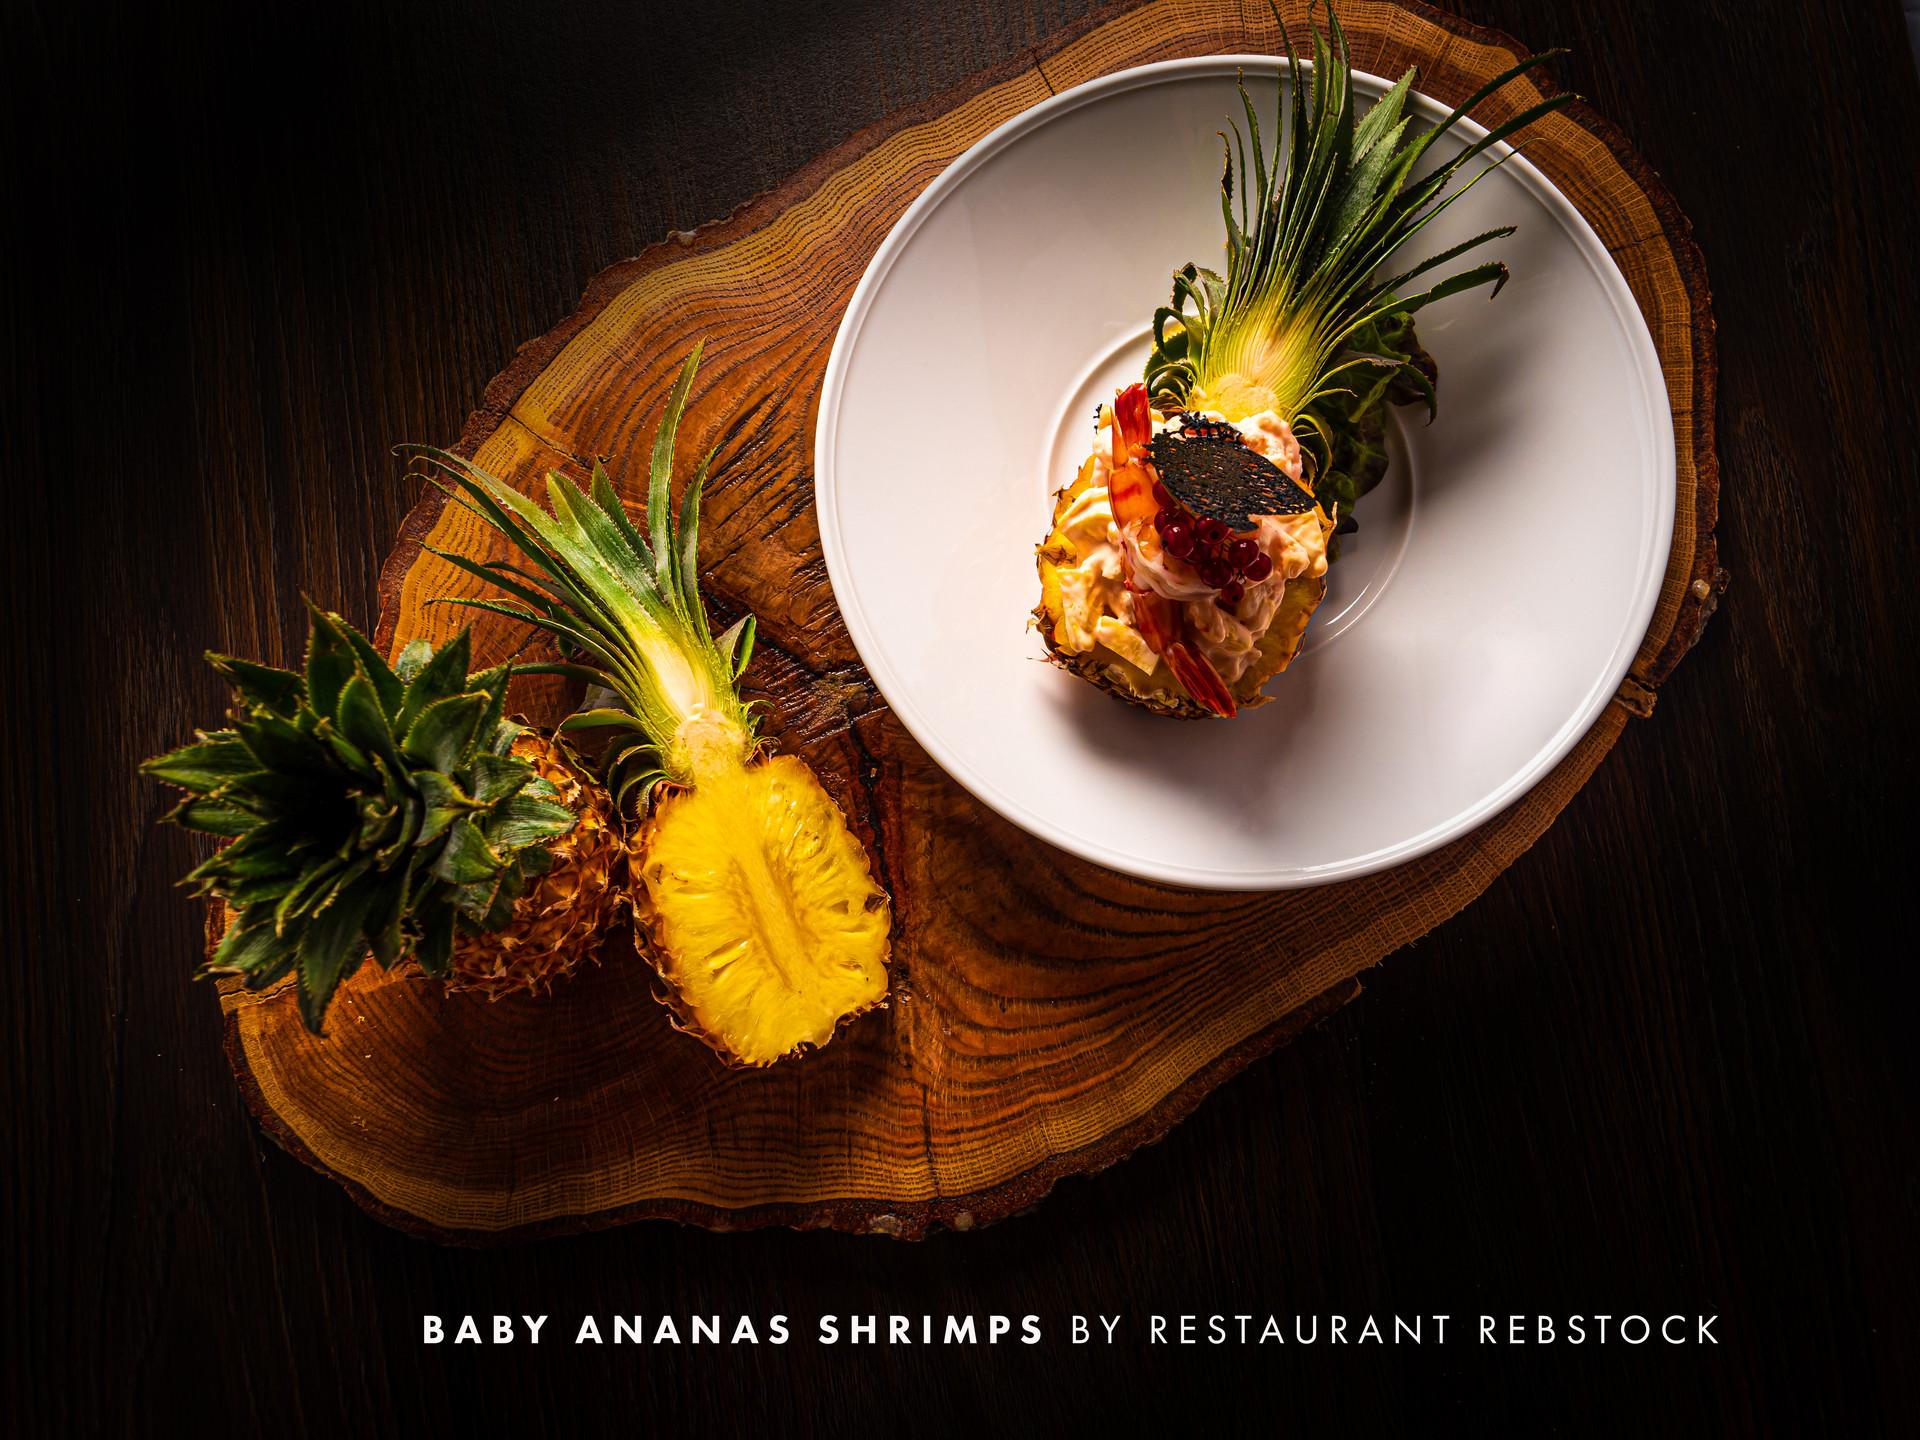 Restaurant_Rebstock_Baby Ananas Shrimps